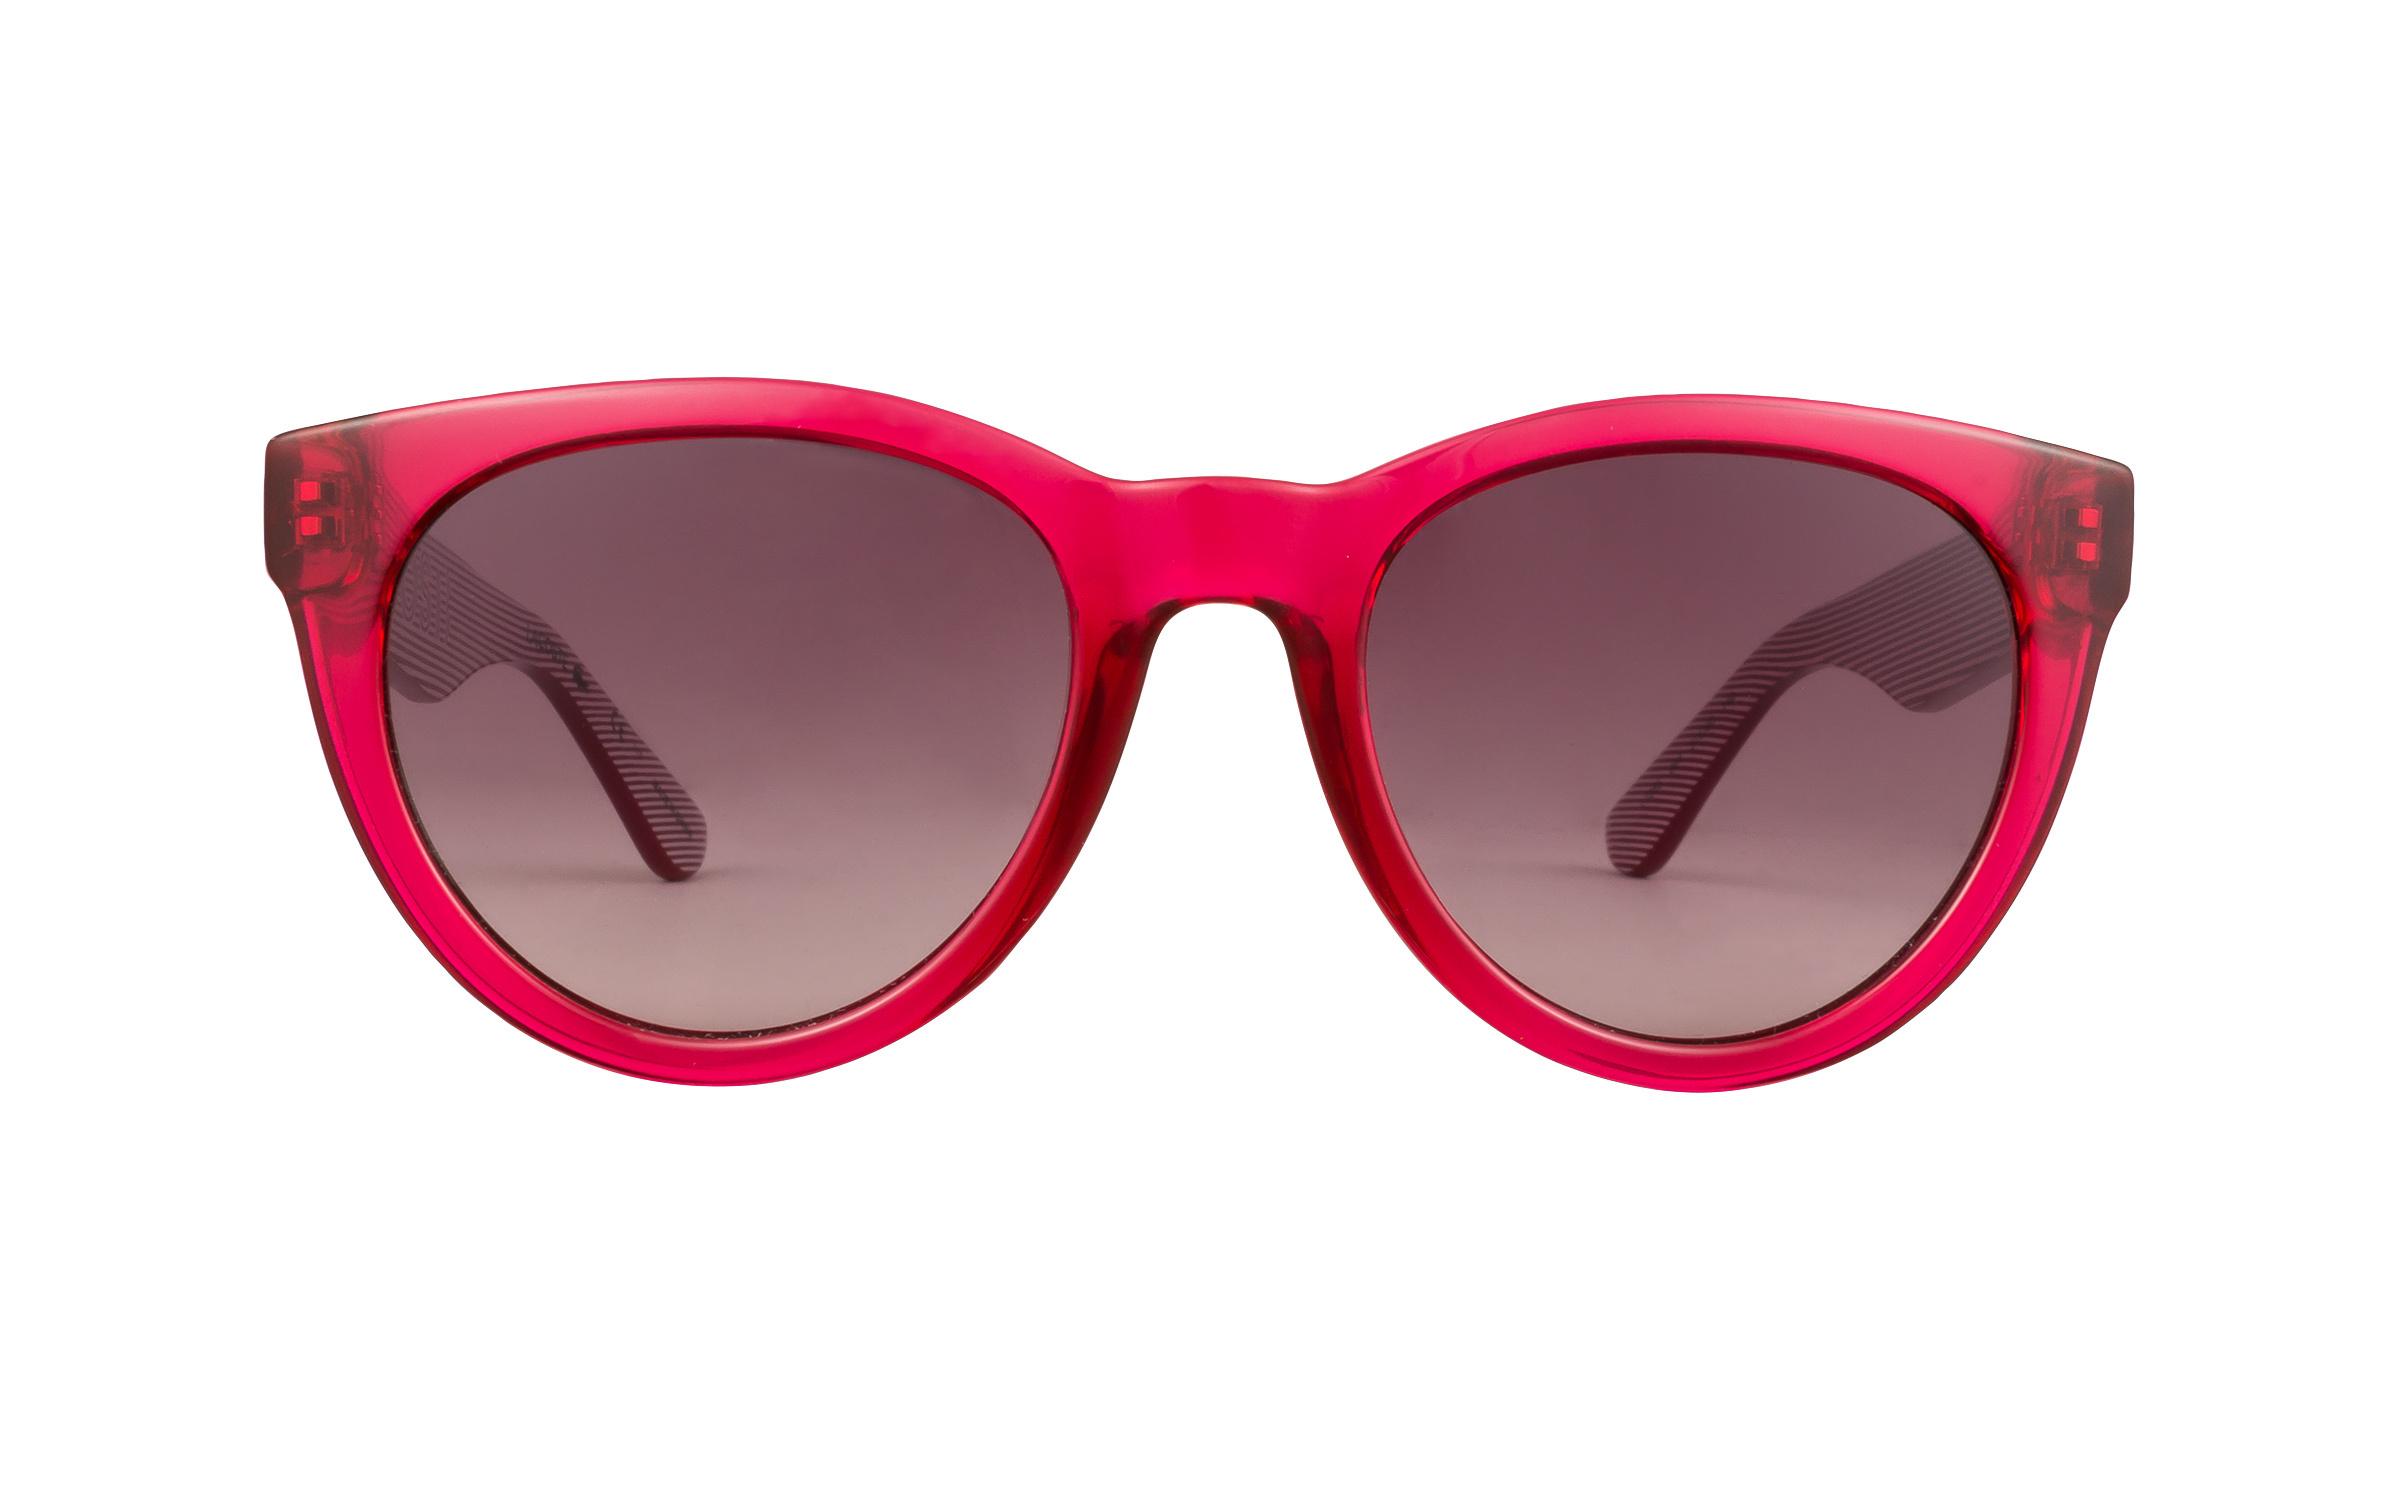 Lacoste L788S 664 Pink 52 Sunglasses